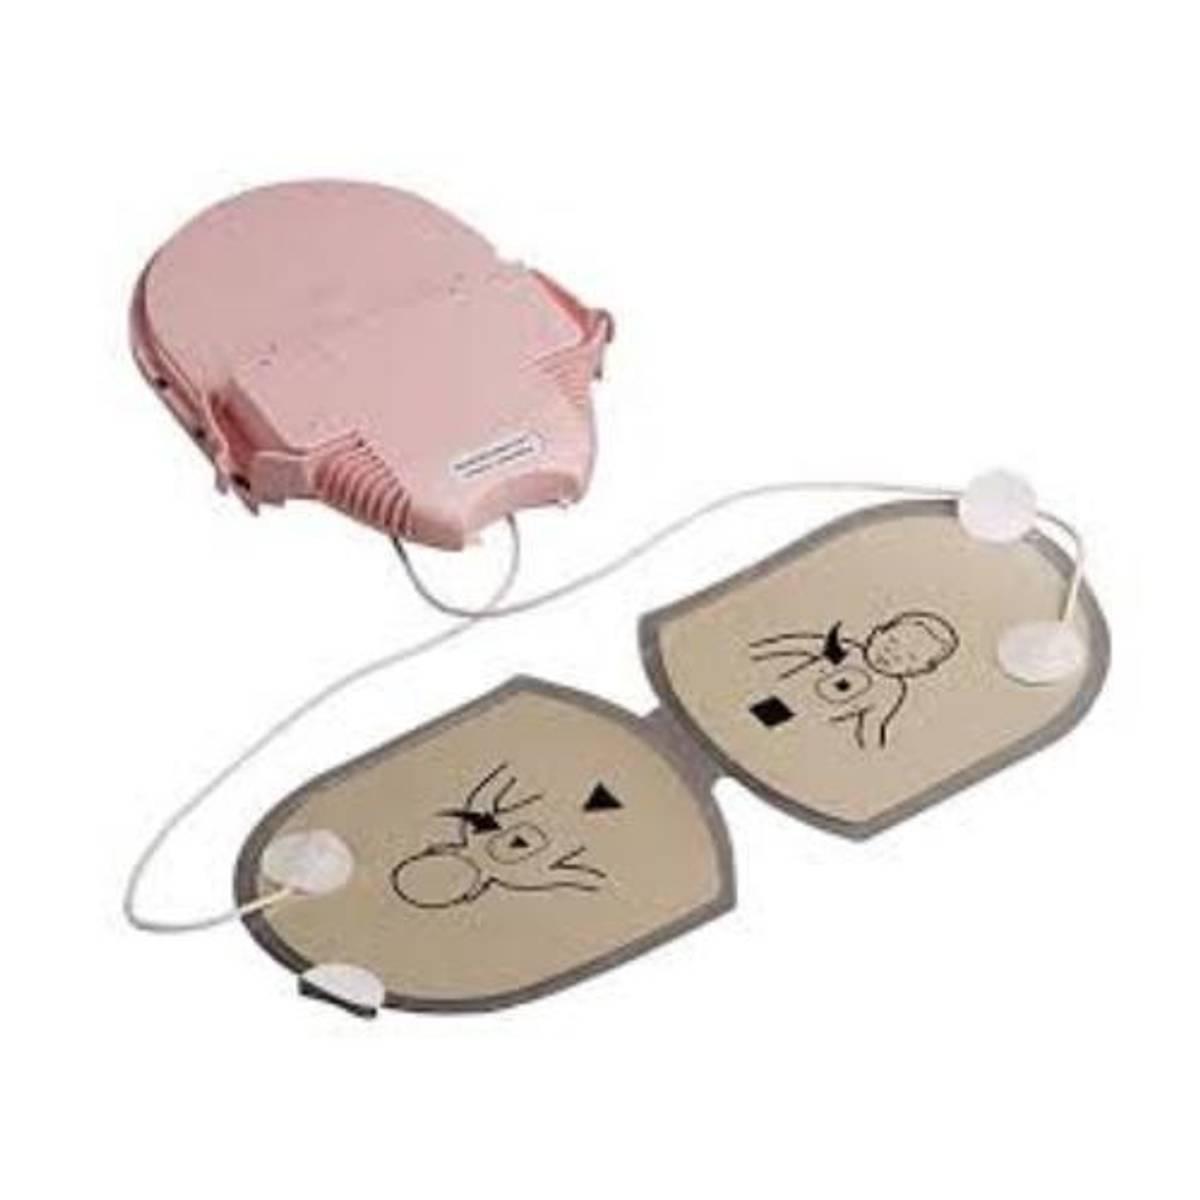 HeartSine batteri med elektrode (Barn) PAD350P/PAD500P